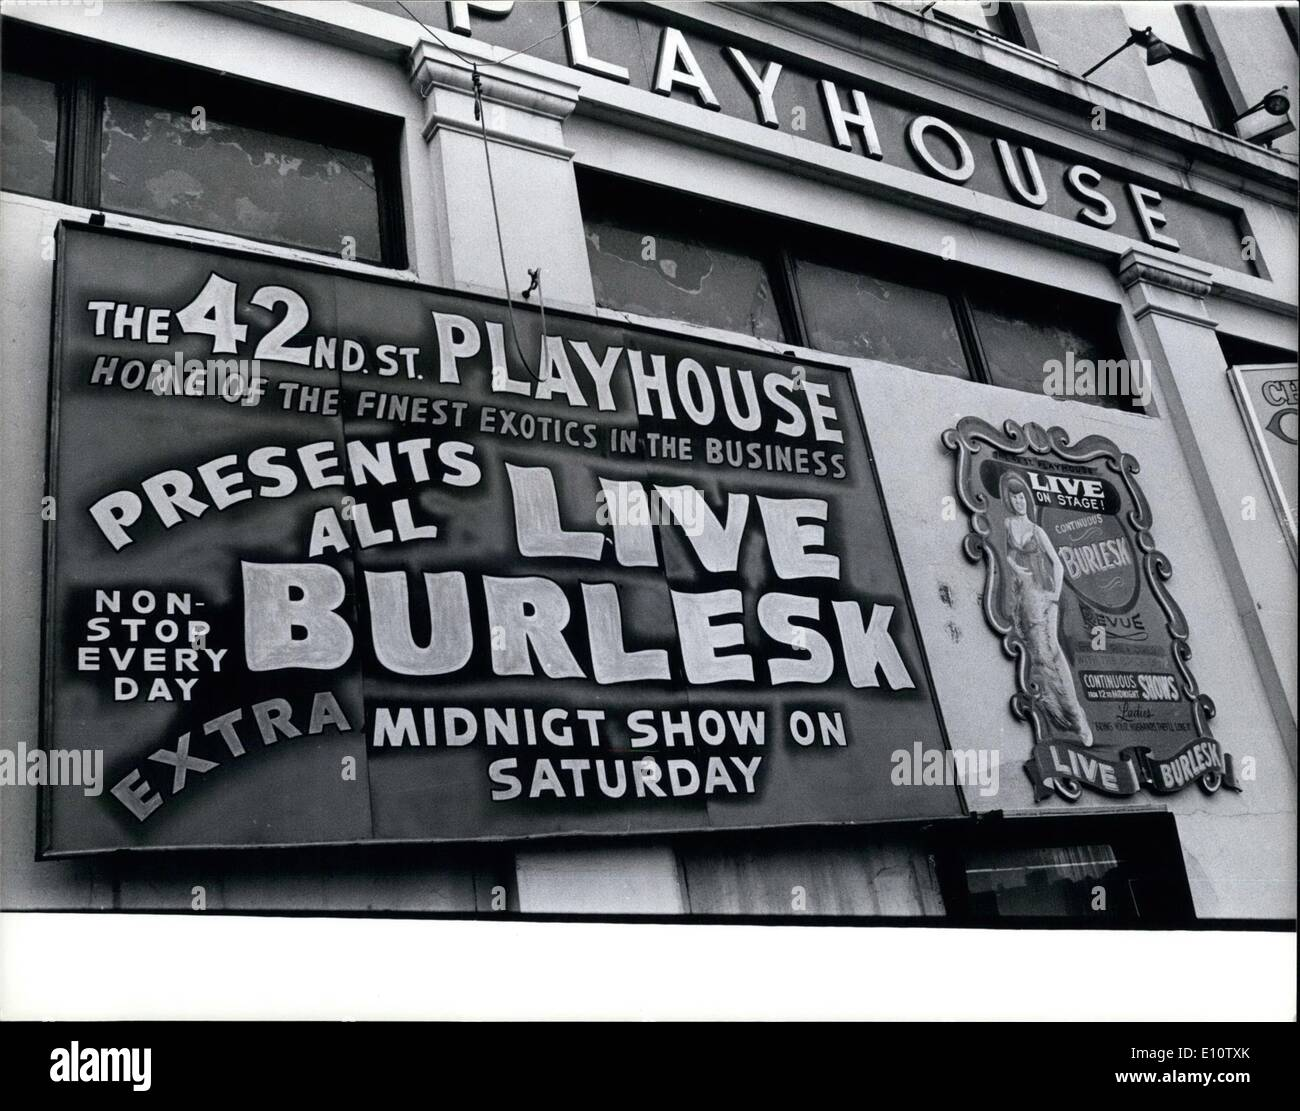 Mar. 03, 1974 - 42nd St. Prayhouse Theatre - Stock Image